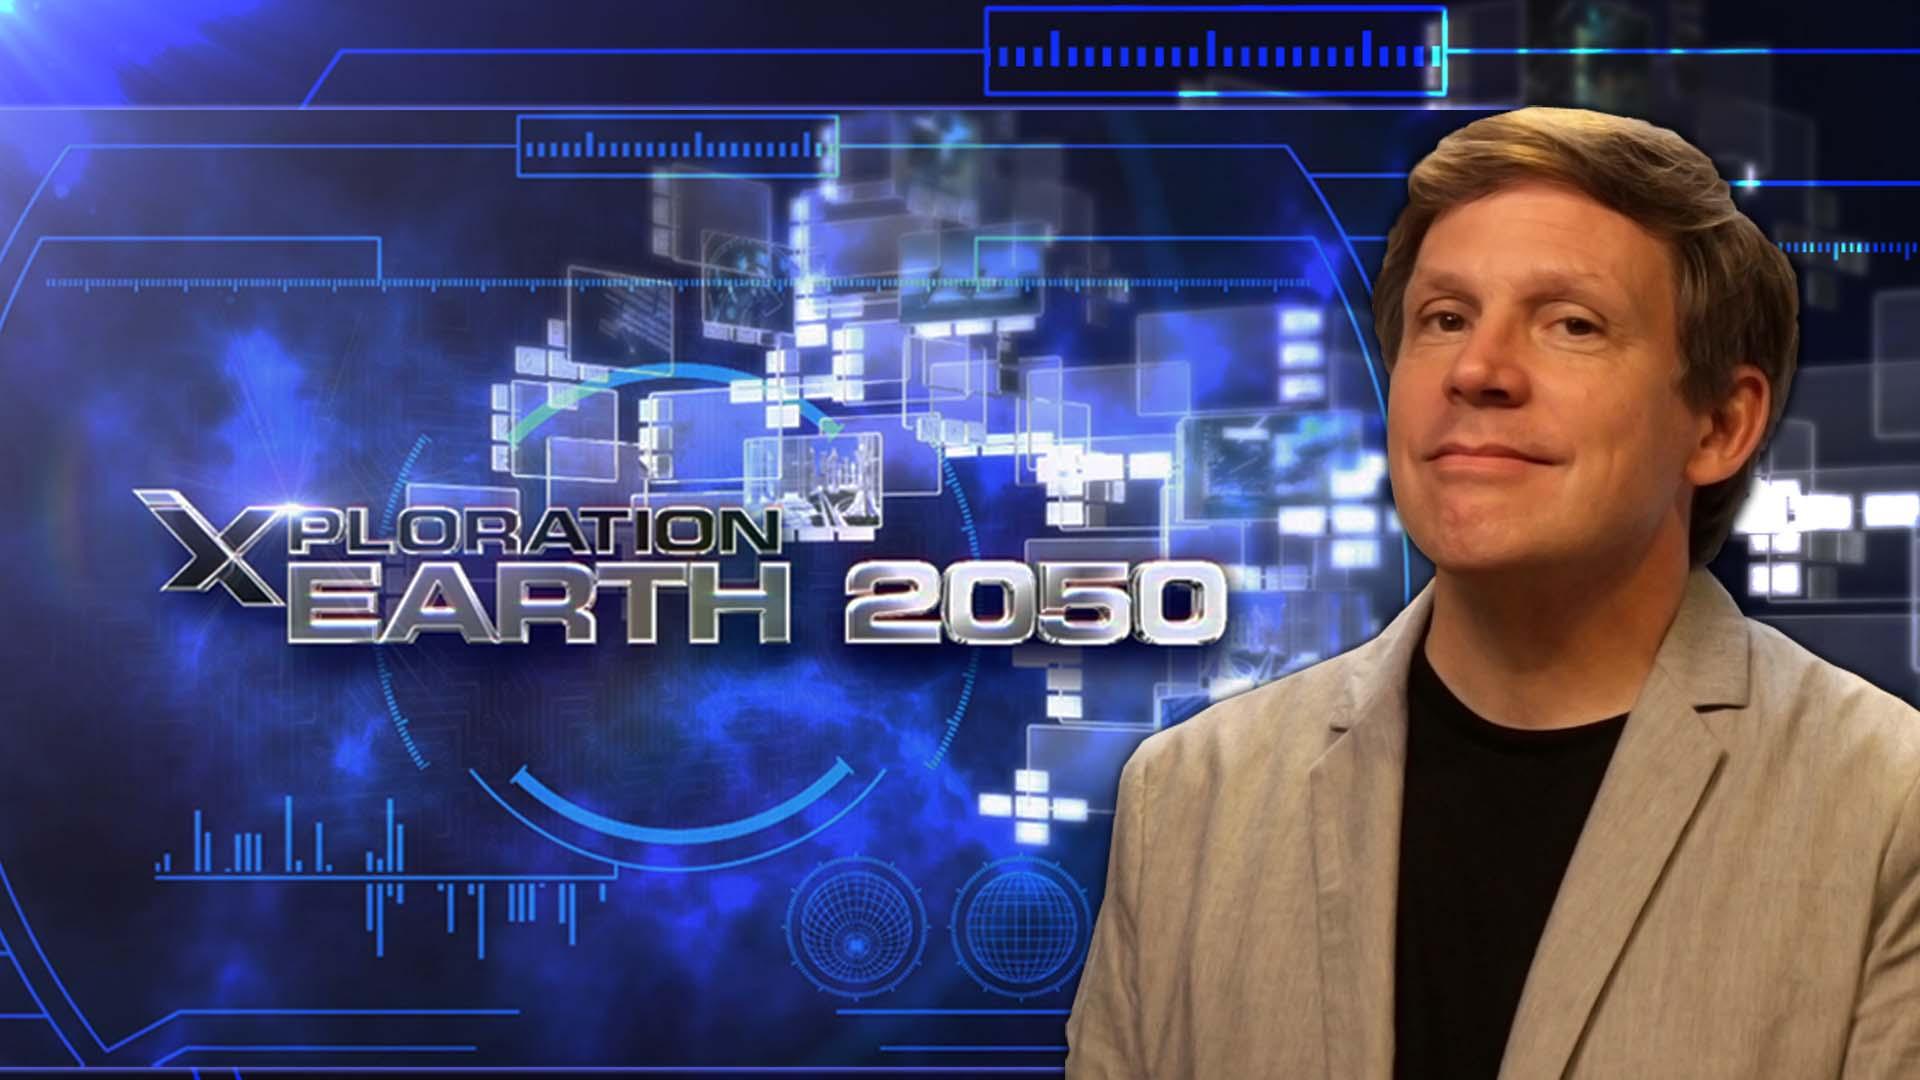 Xploration Earth 2050 -